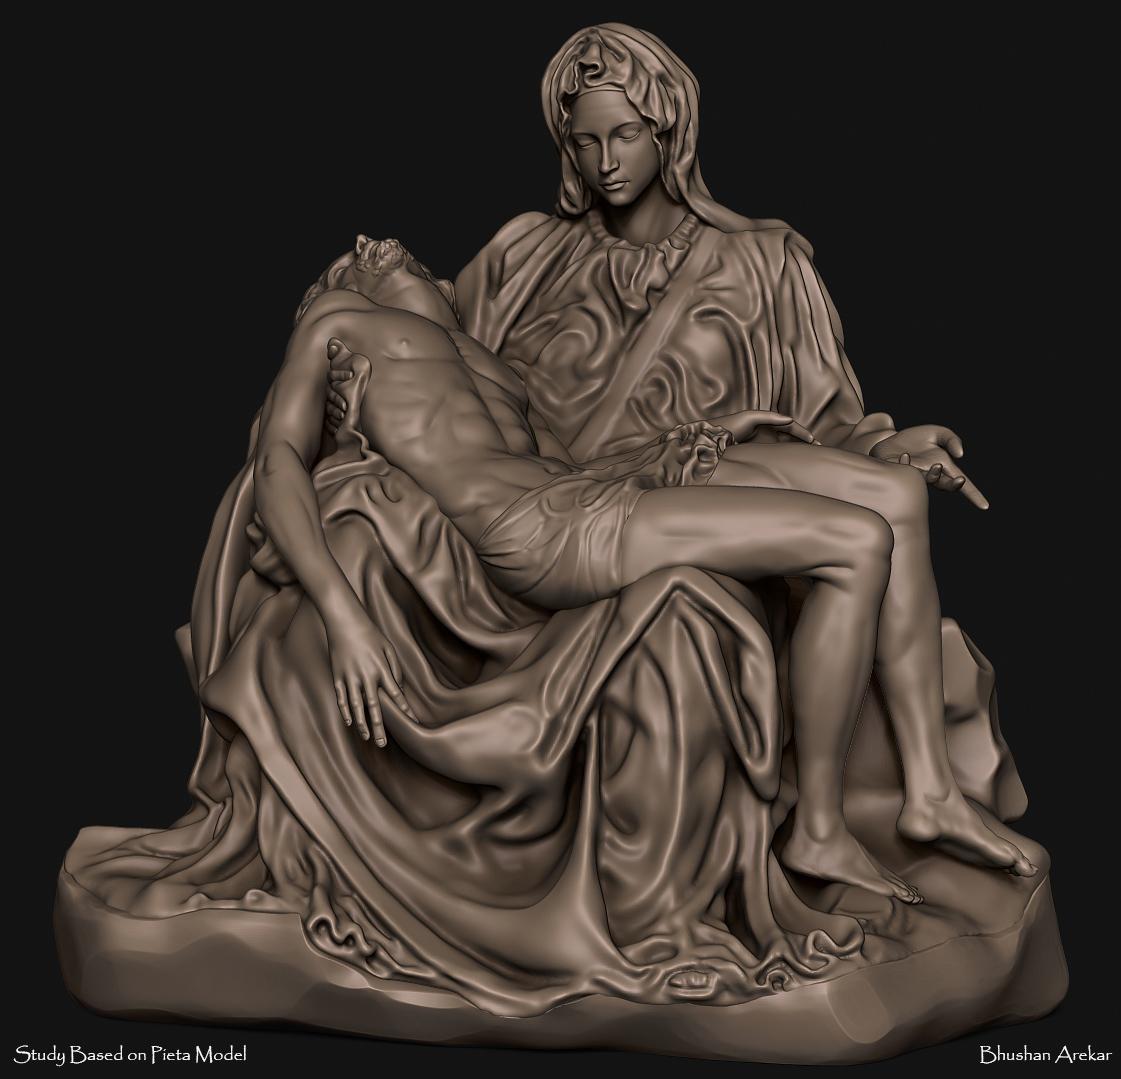 Pieta_Study by BhushanArekar   3D   CGSociety